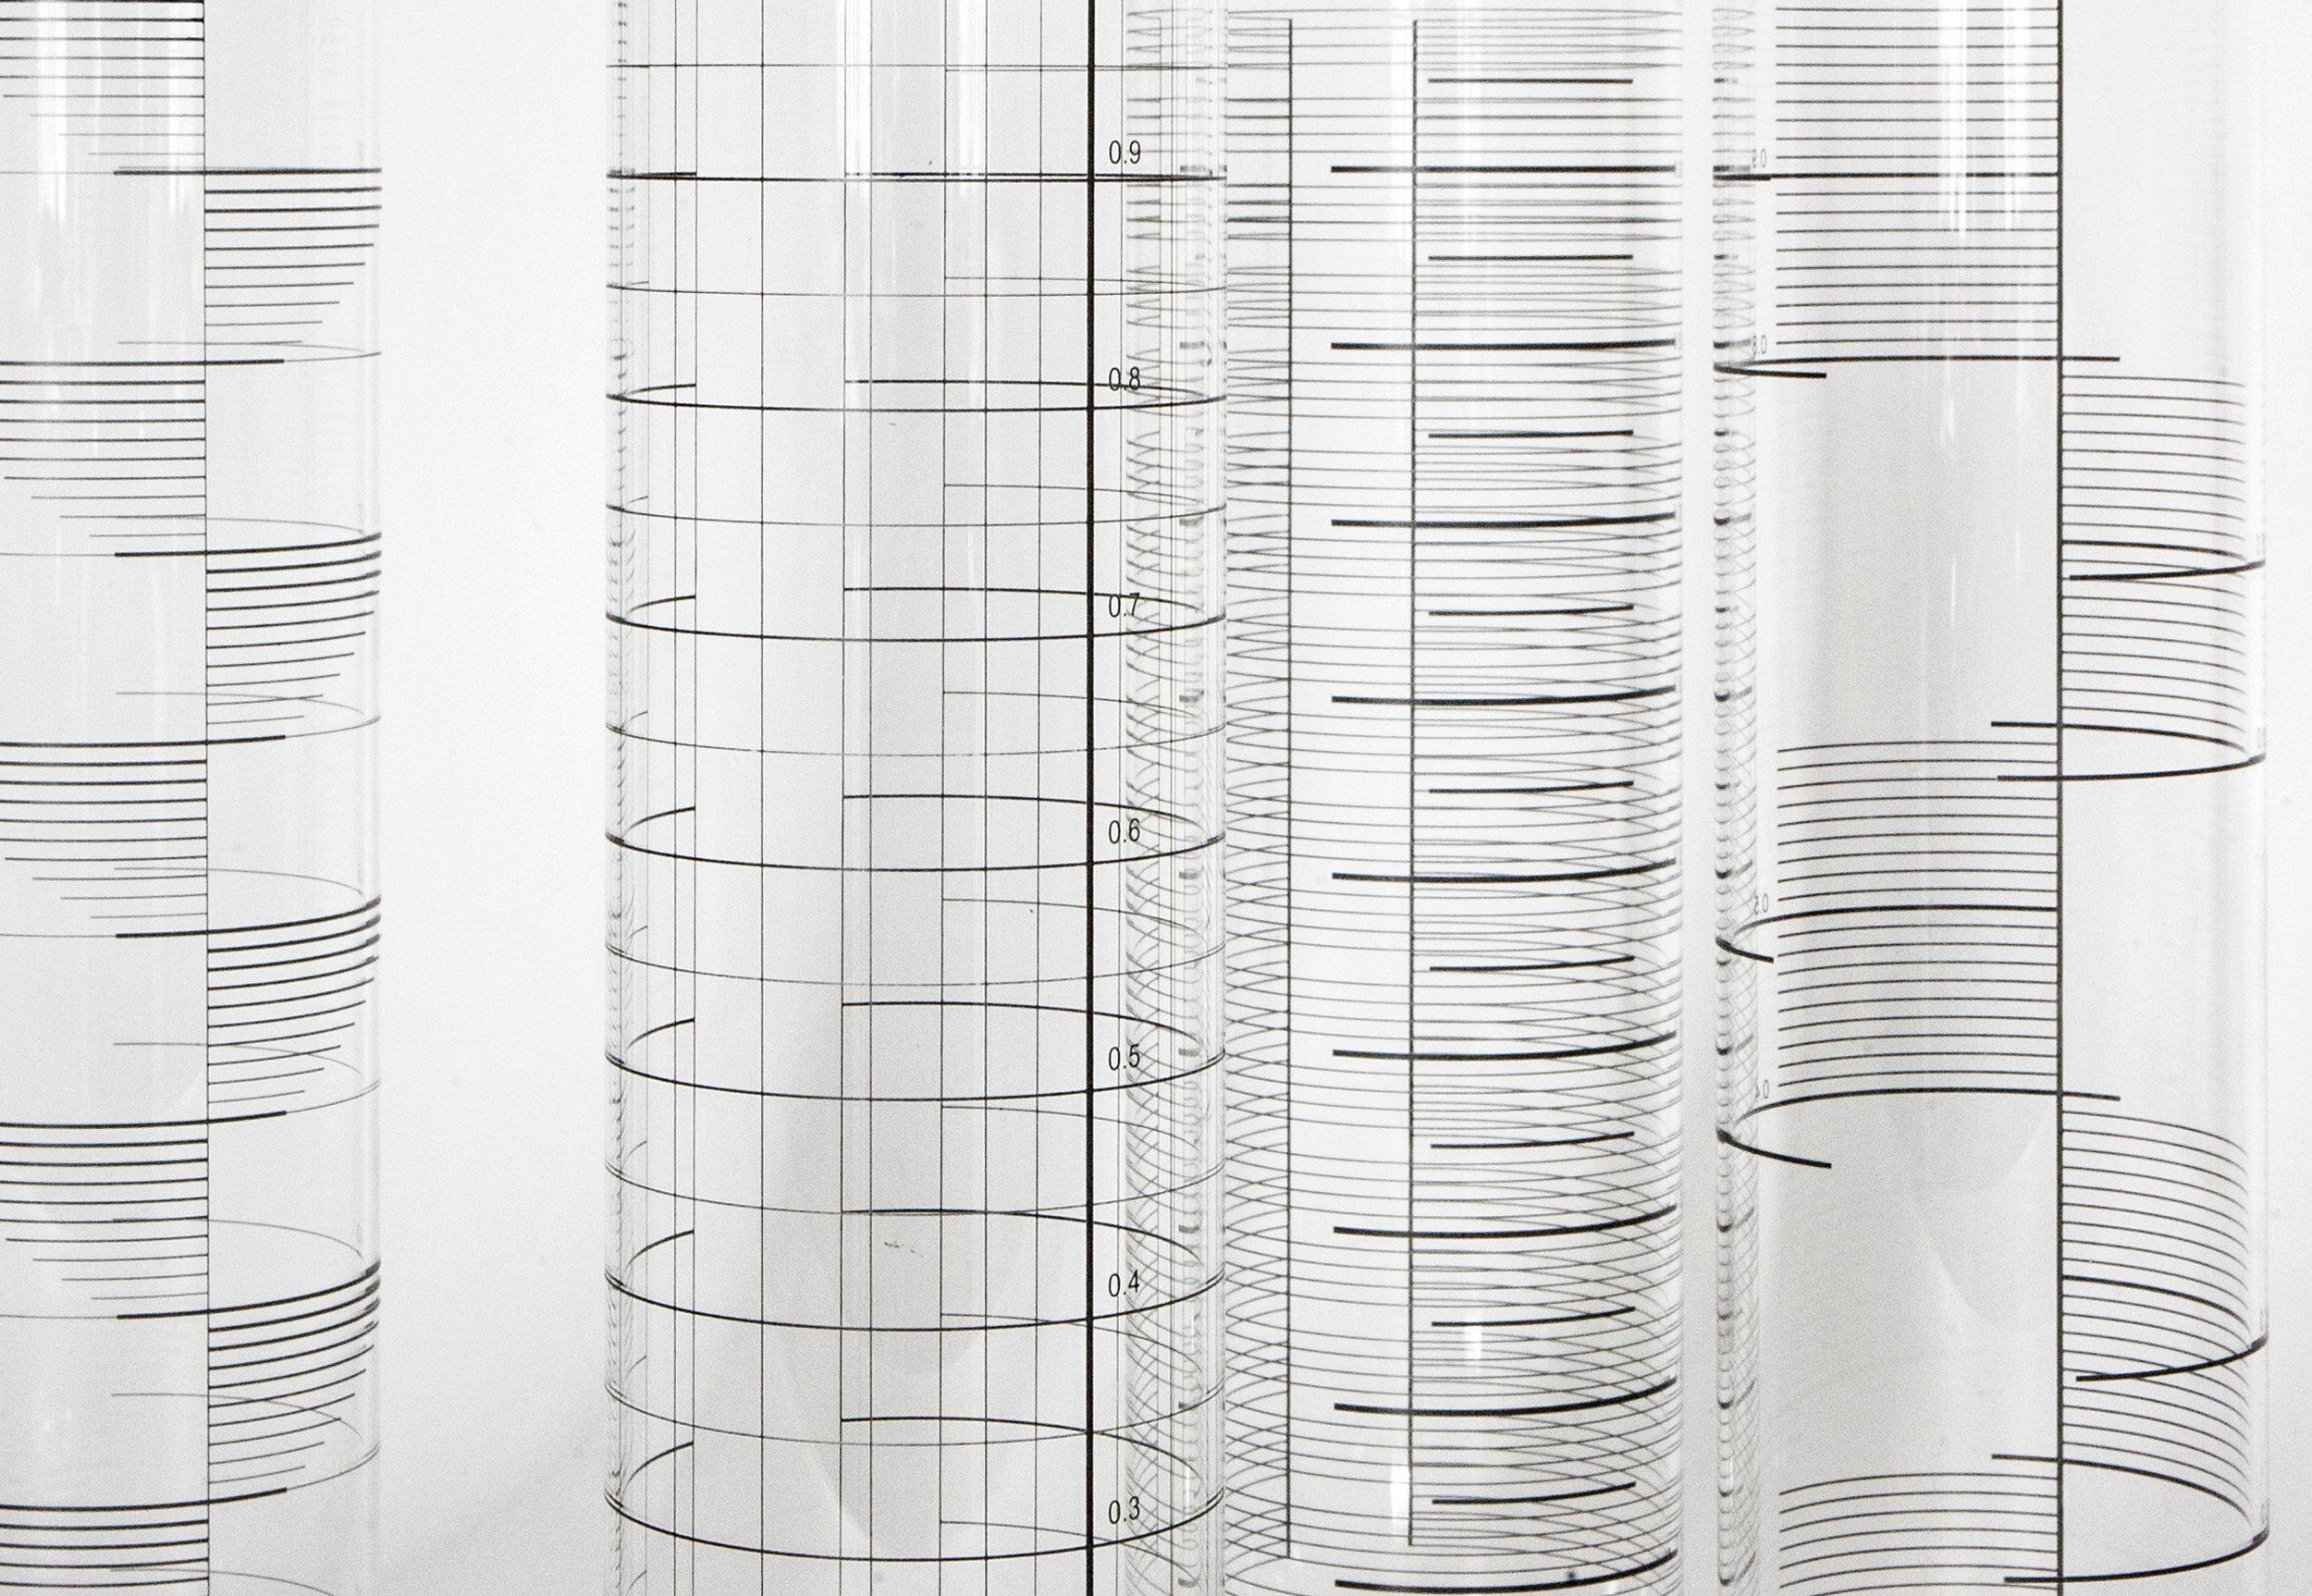 1L Carafes 01-HR-David Derksen Design.jpg